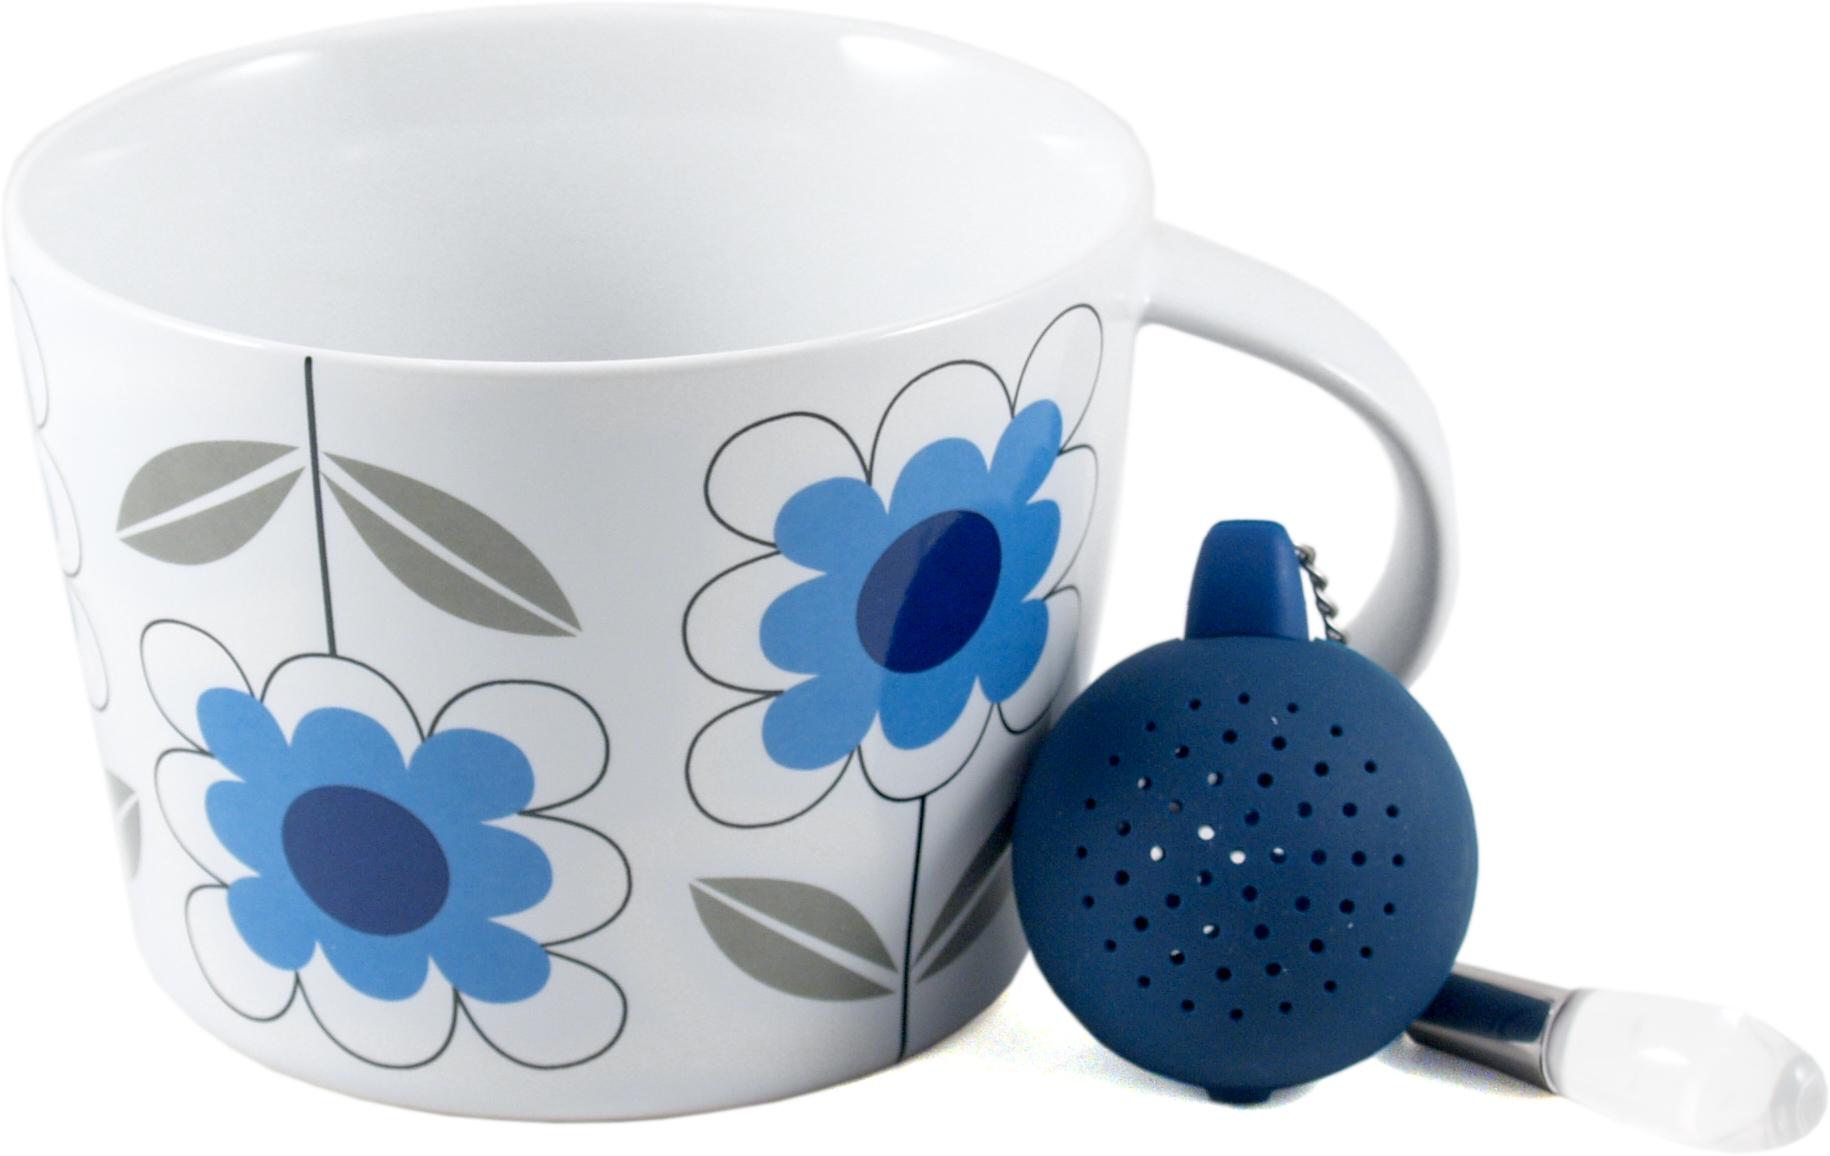 Sagaform White and Blue Stoneware Daisy Tea Set